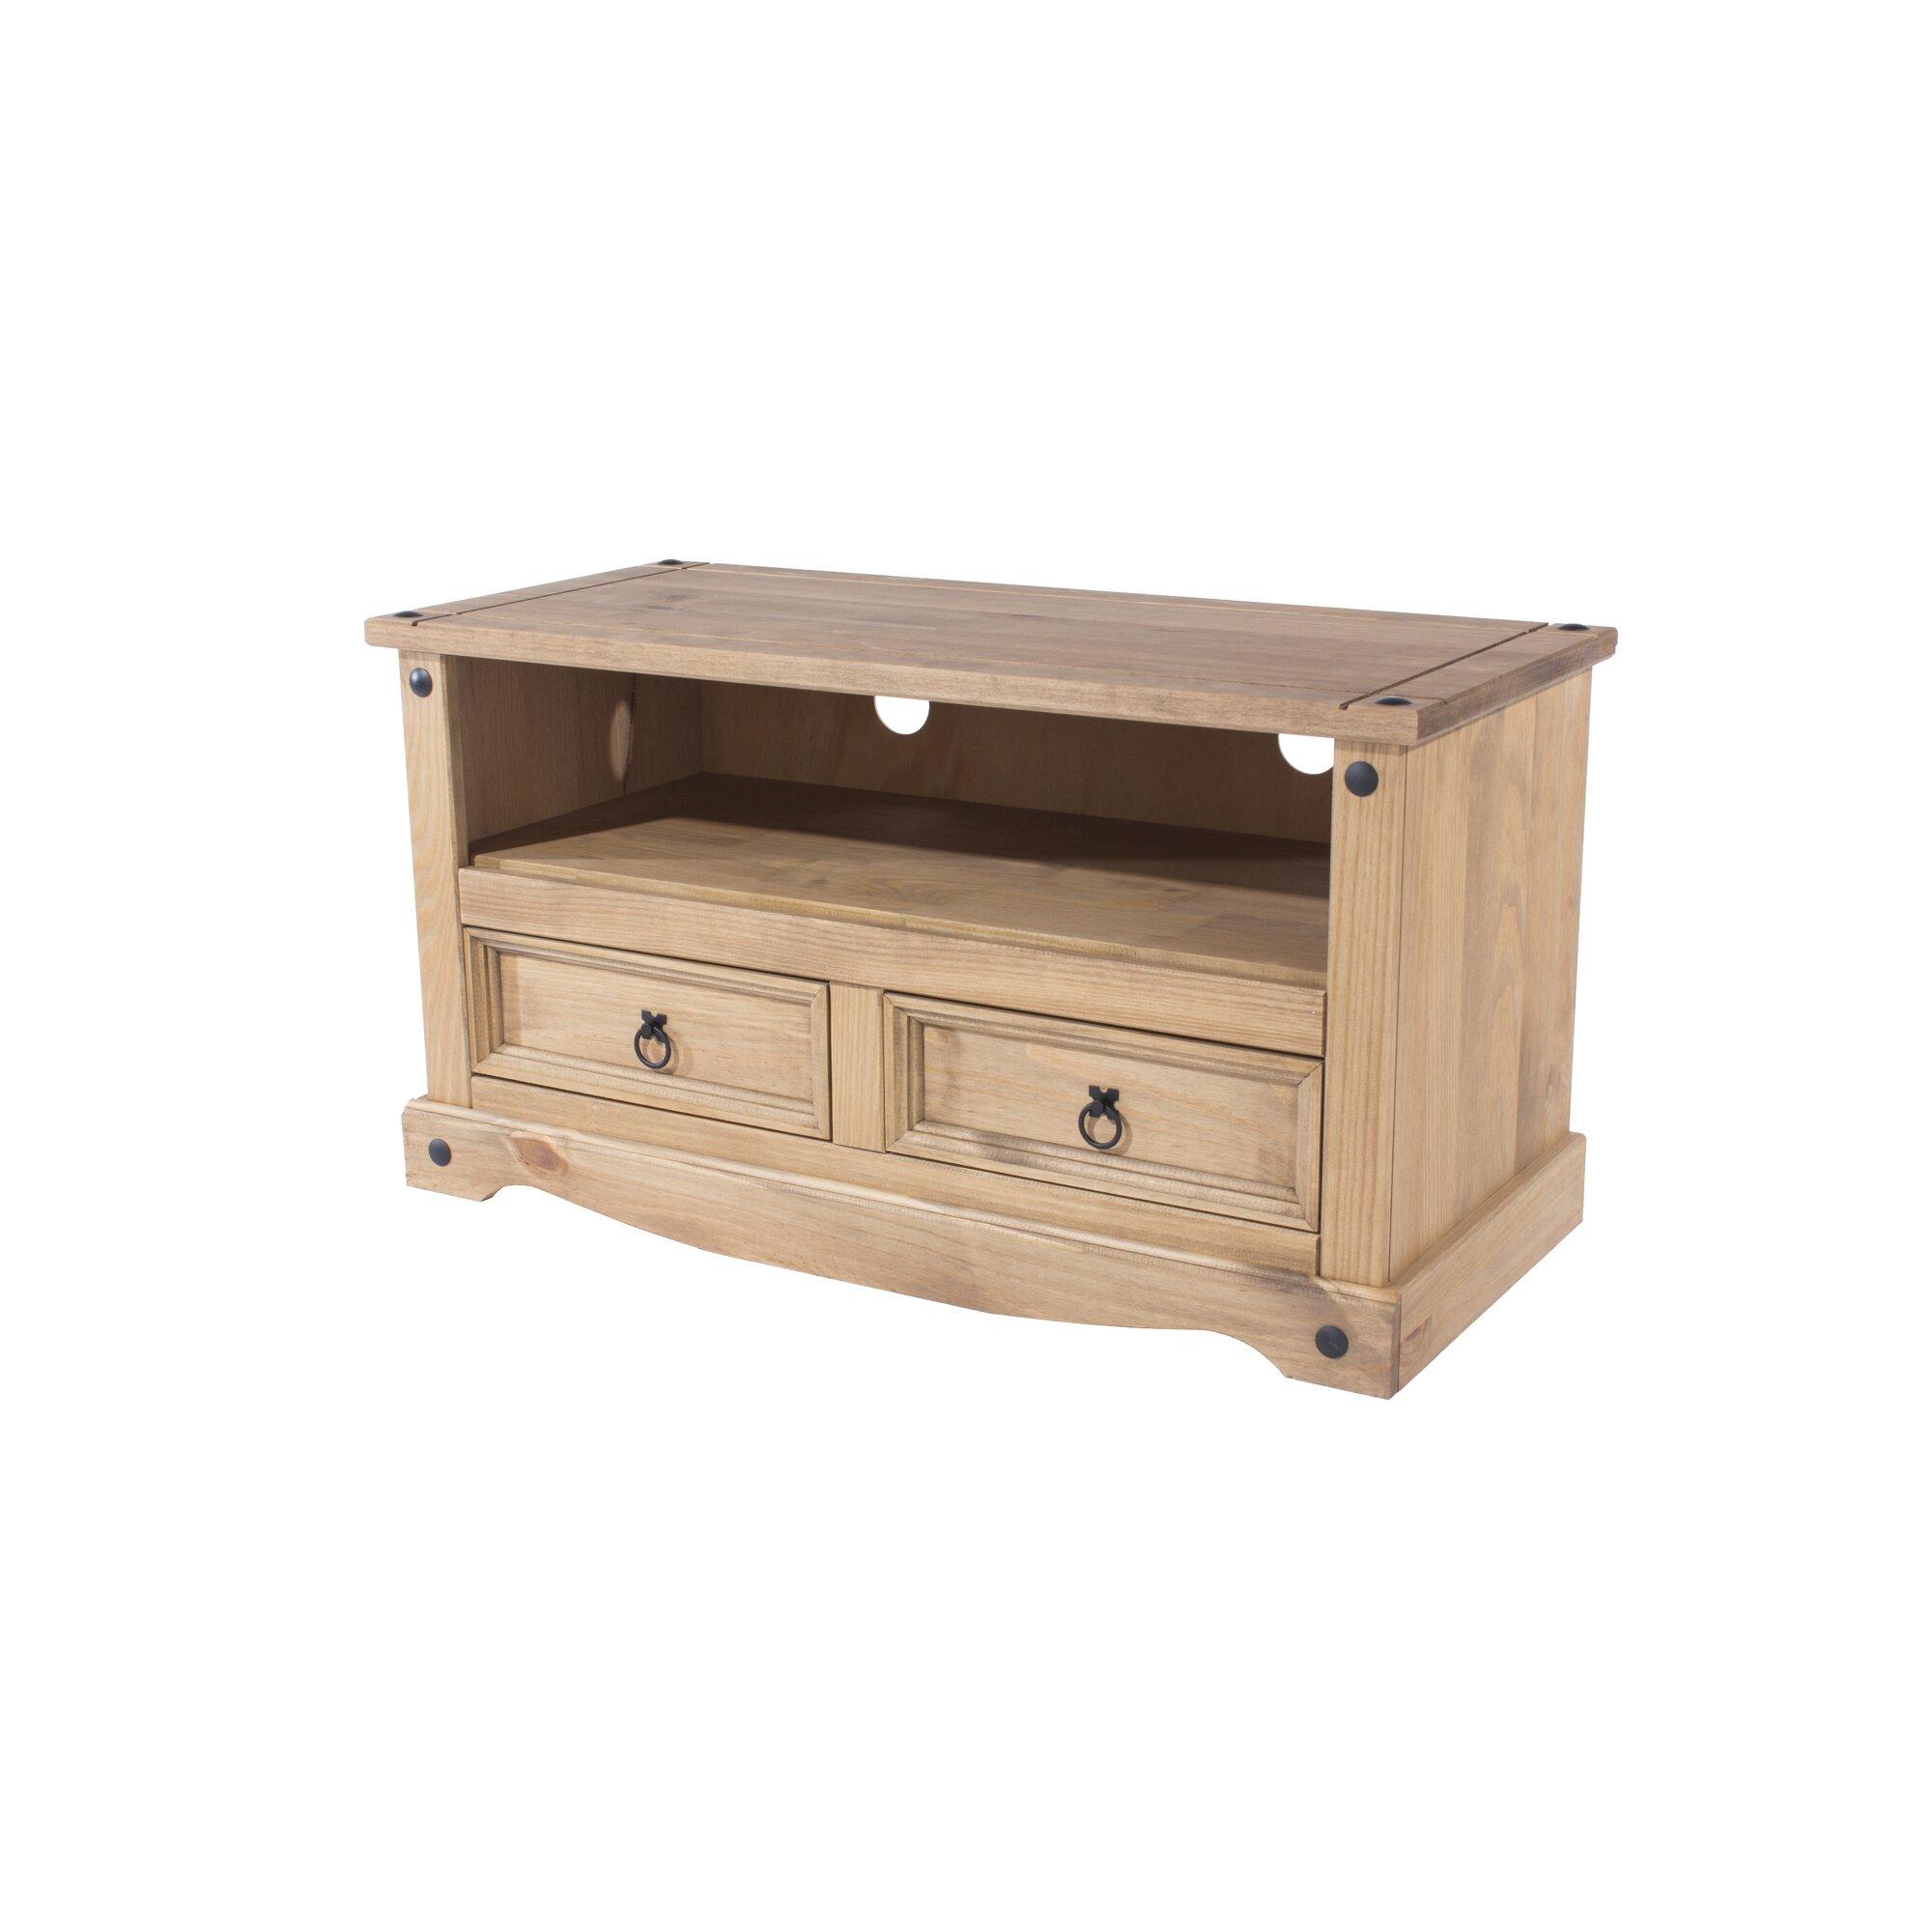 m hlenhaus tv schrank classic corona f r tvs bis zu 50. Black Bedroom Furniture Sets. Home Design Ideas